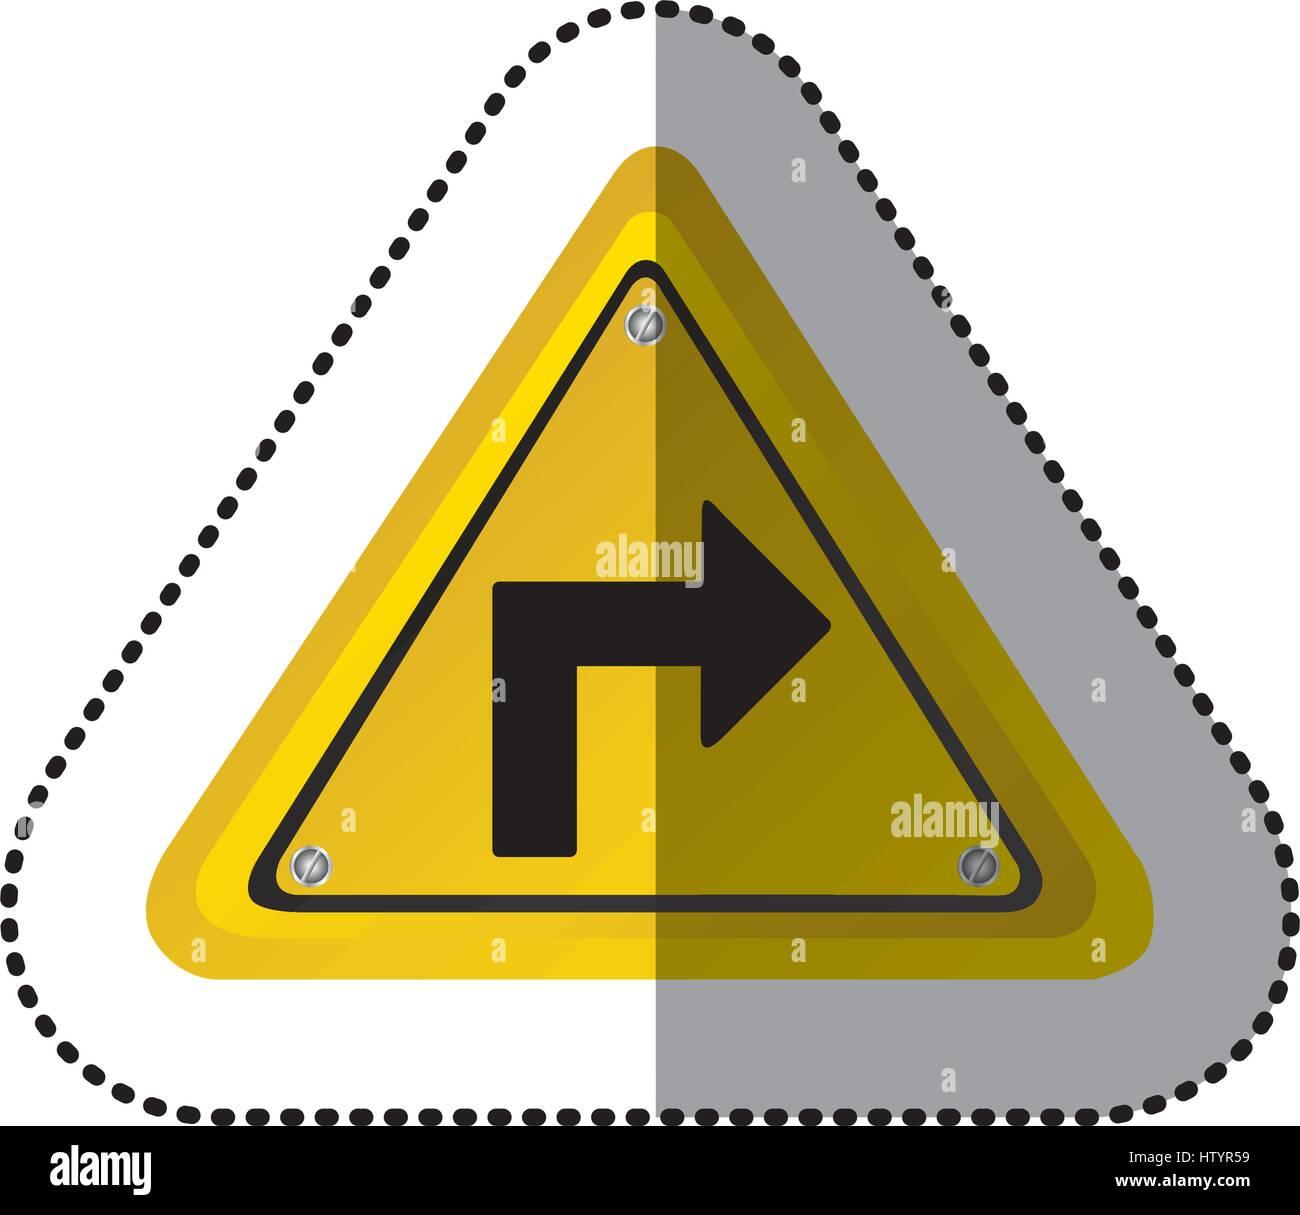 Aufkleber gelbes Dreieck Rahmen drehen Rechts Verkehrszeichen Vektor ...